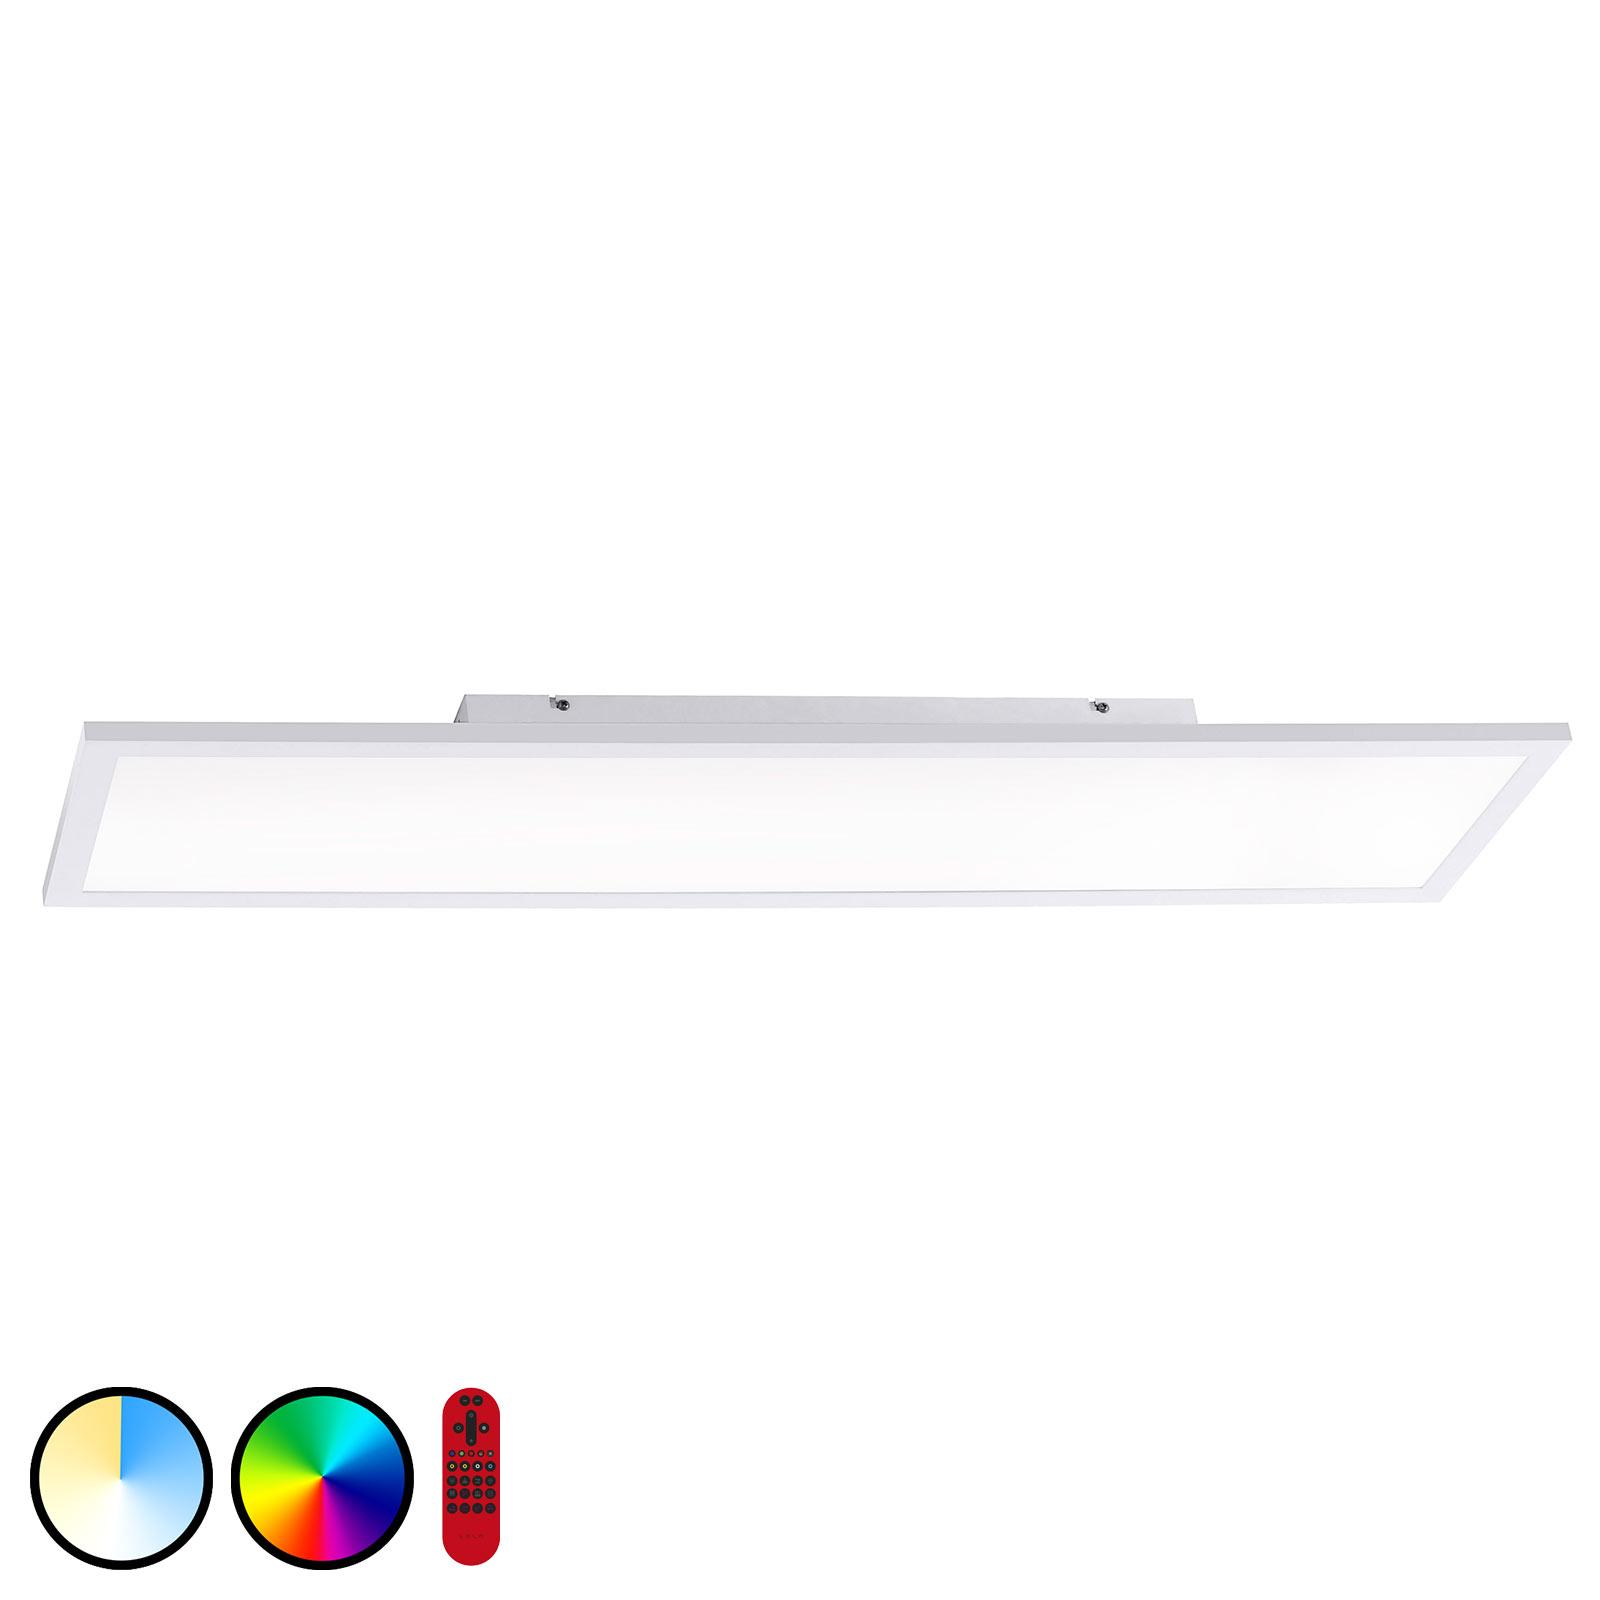 LED plafondlamp LOLAsmart Flat, 100 x 25 cm